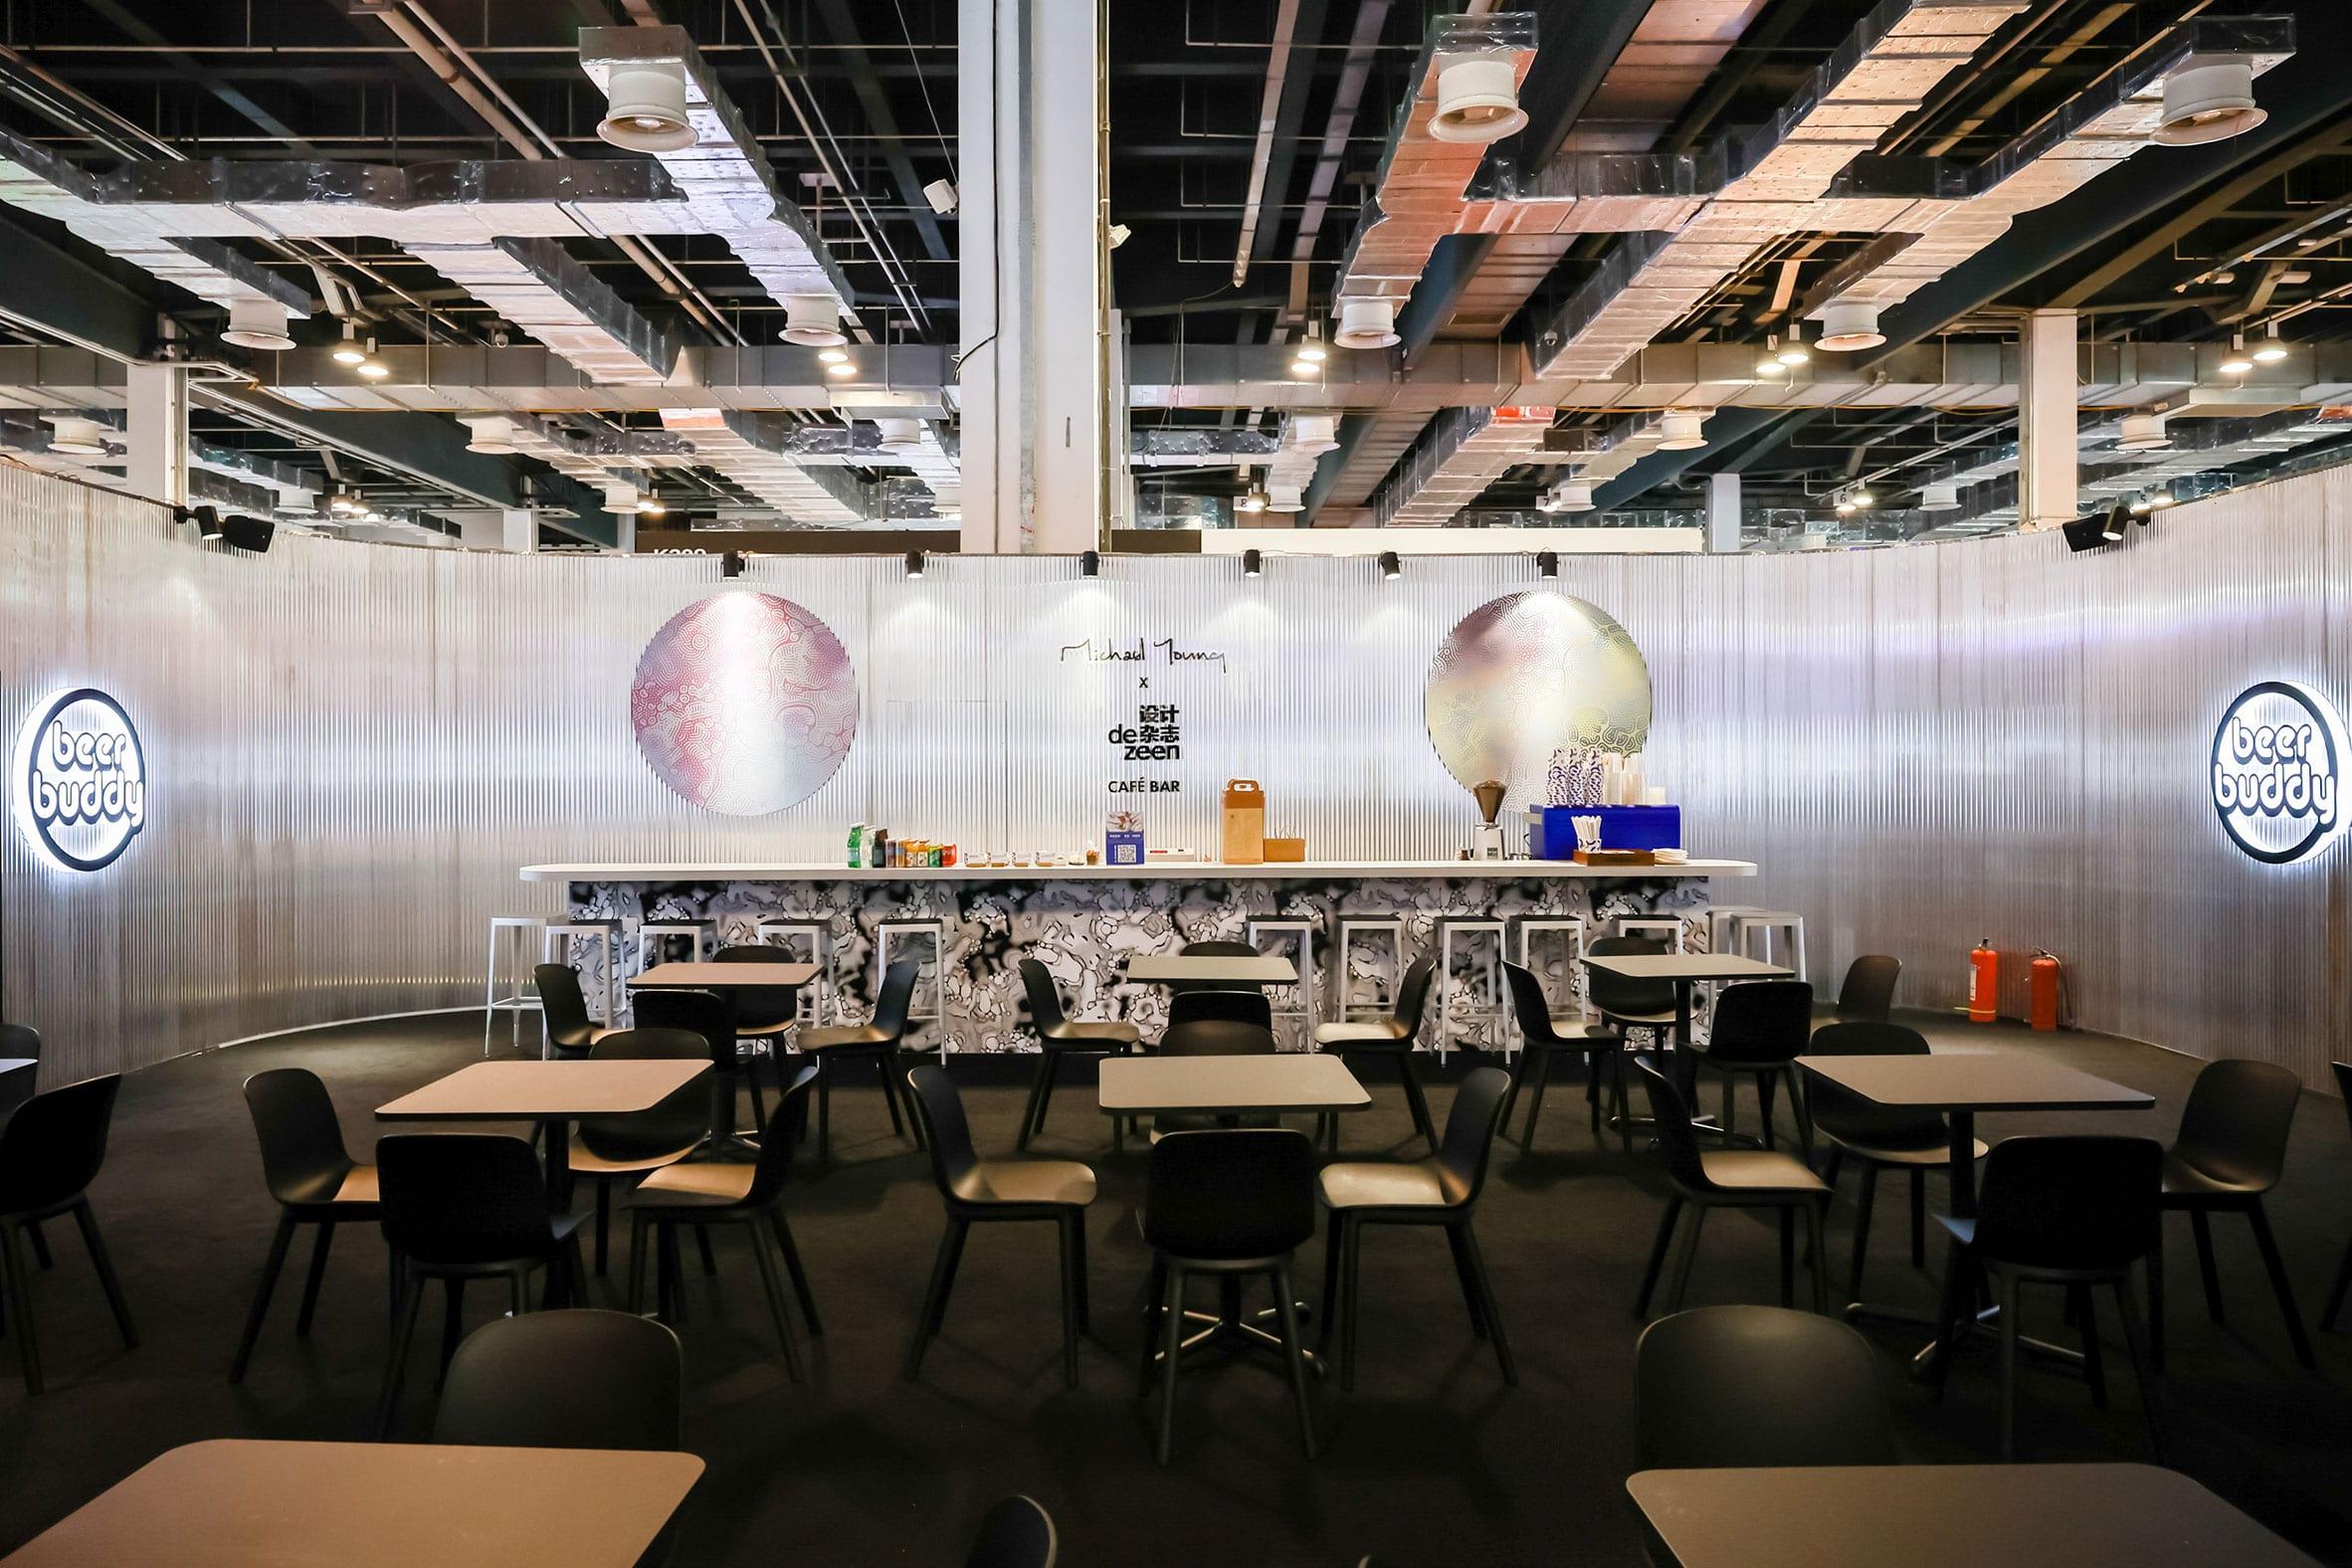 Michael Young x Dezeen cafe and bar at Design Shanghai